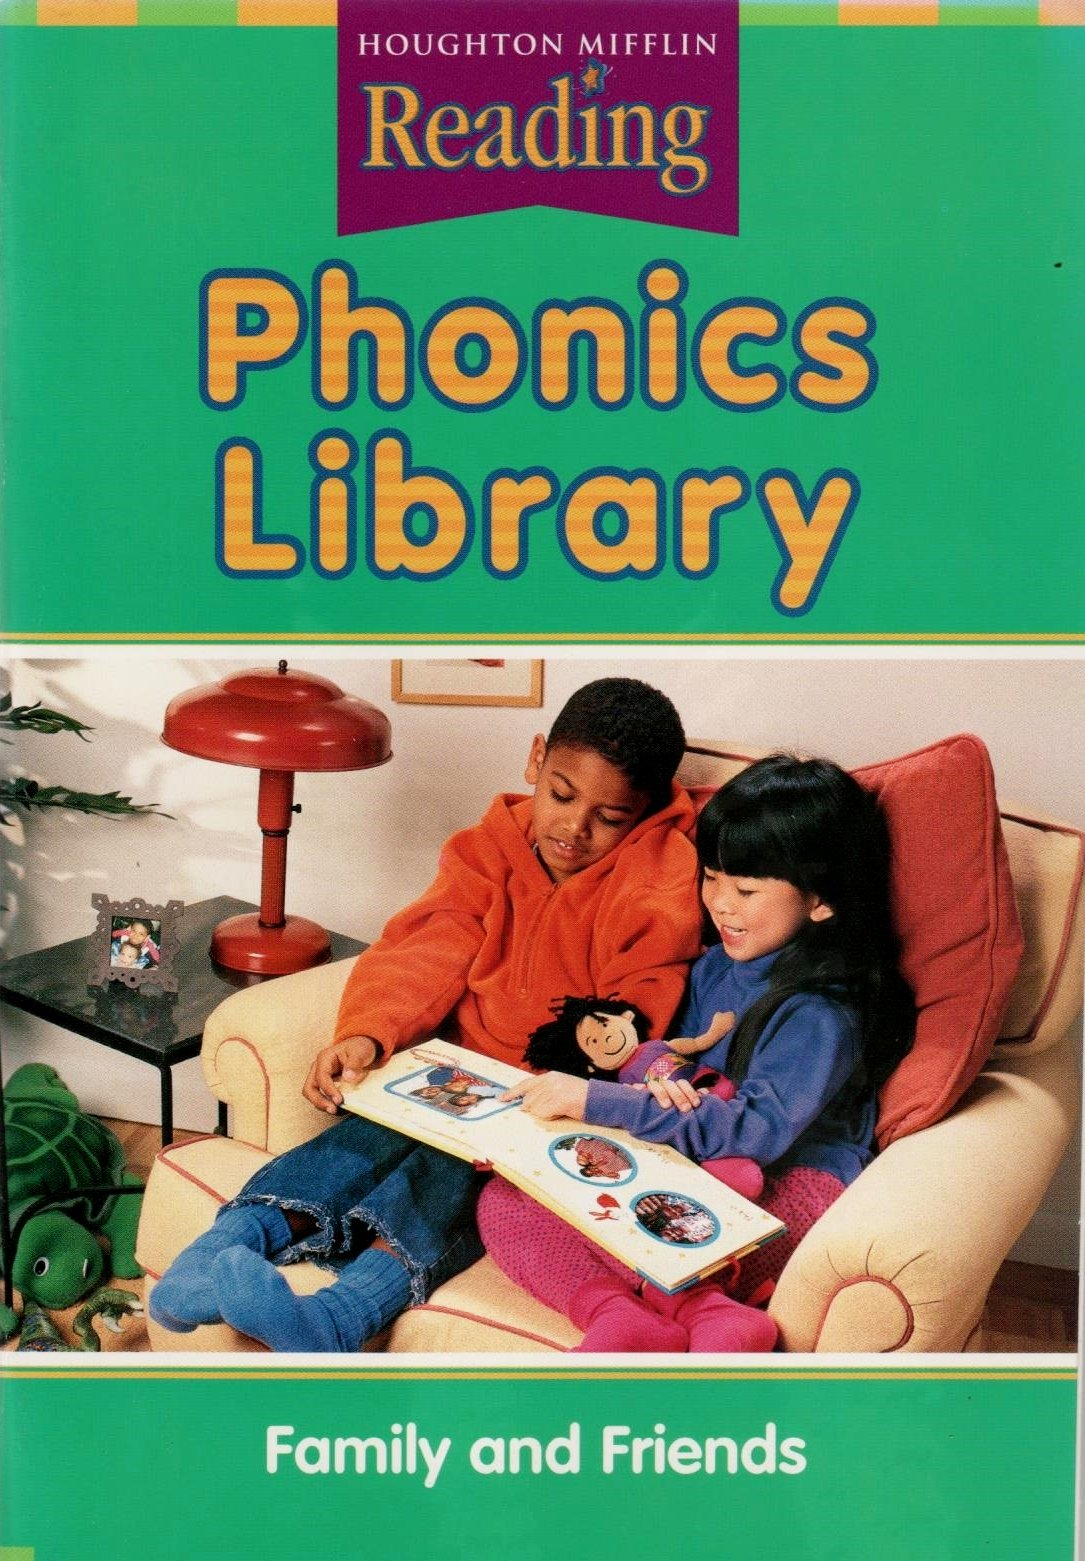 Read Online Houghton Mifflin Reading: Phonics Library Lv 1 Thm 4 (Houghton Mifflin Reading: A Legacy of Literacy) pdf epub